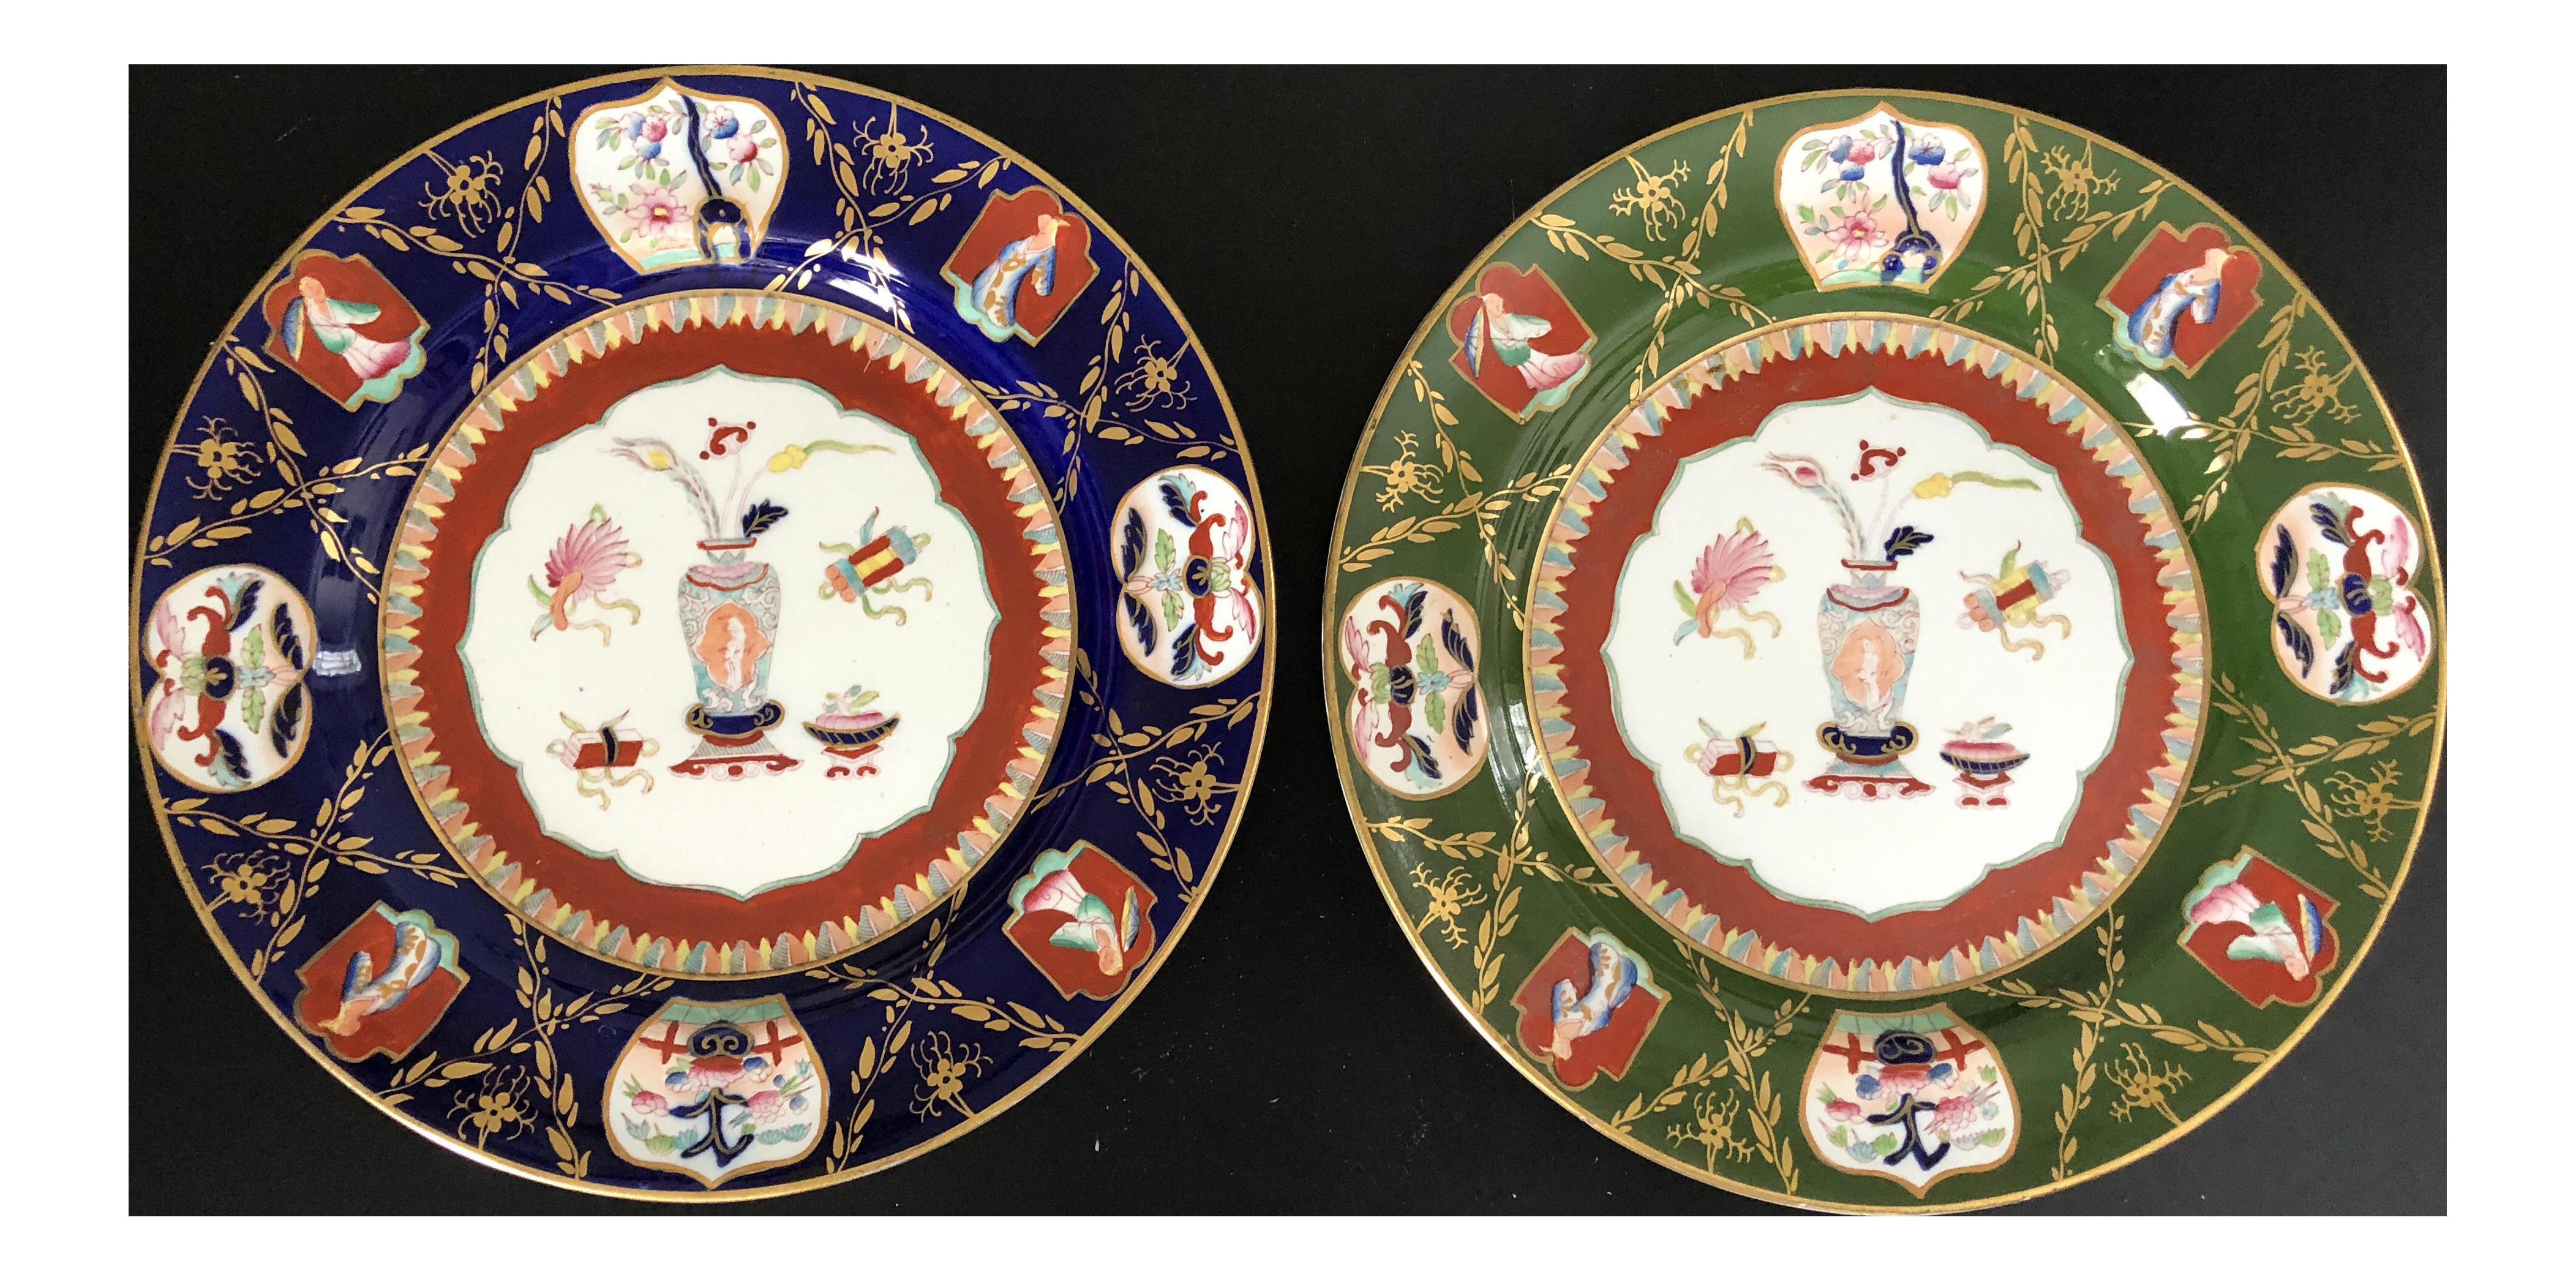 Antique Ashworth Mason\u0027s Ironstone Imari Plates - A Pair - Image 1 of 10  sc 1 st  Chairish & Antique Ashworth Mason\u0027s Ironstone Imari Plates - A Pair | Chairish